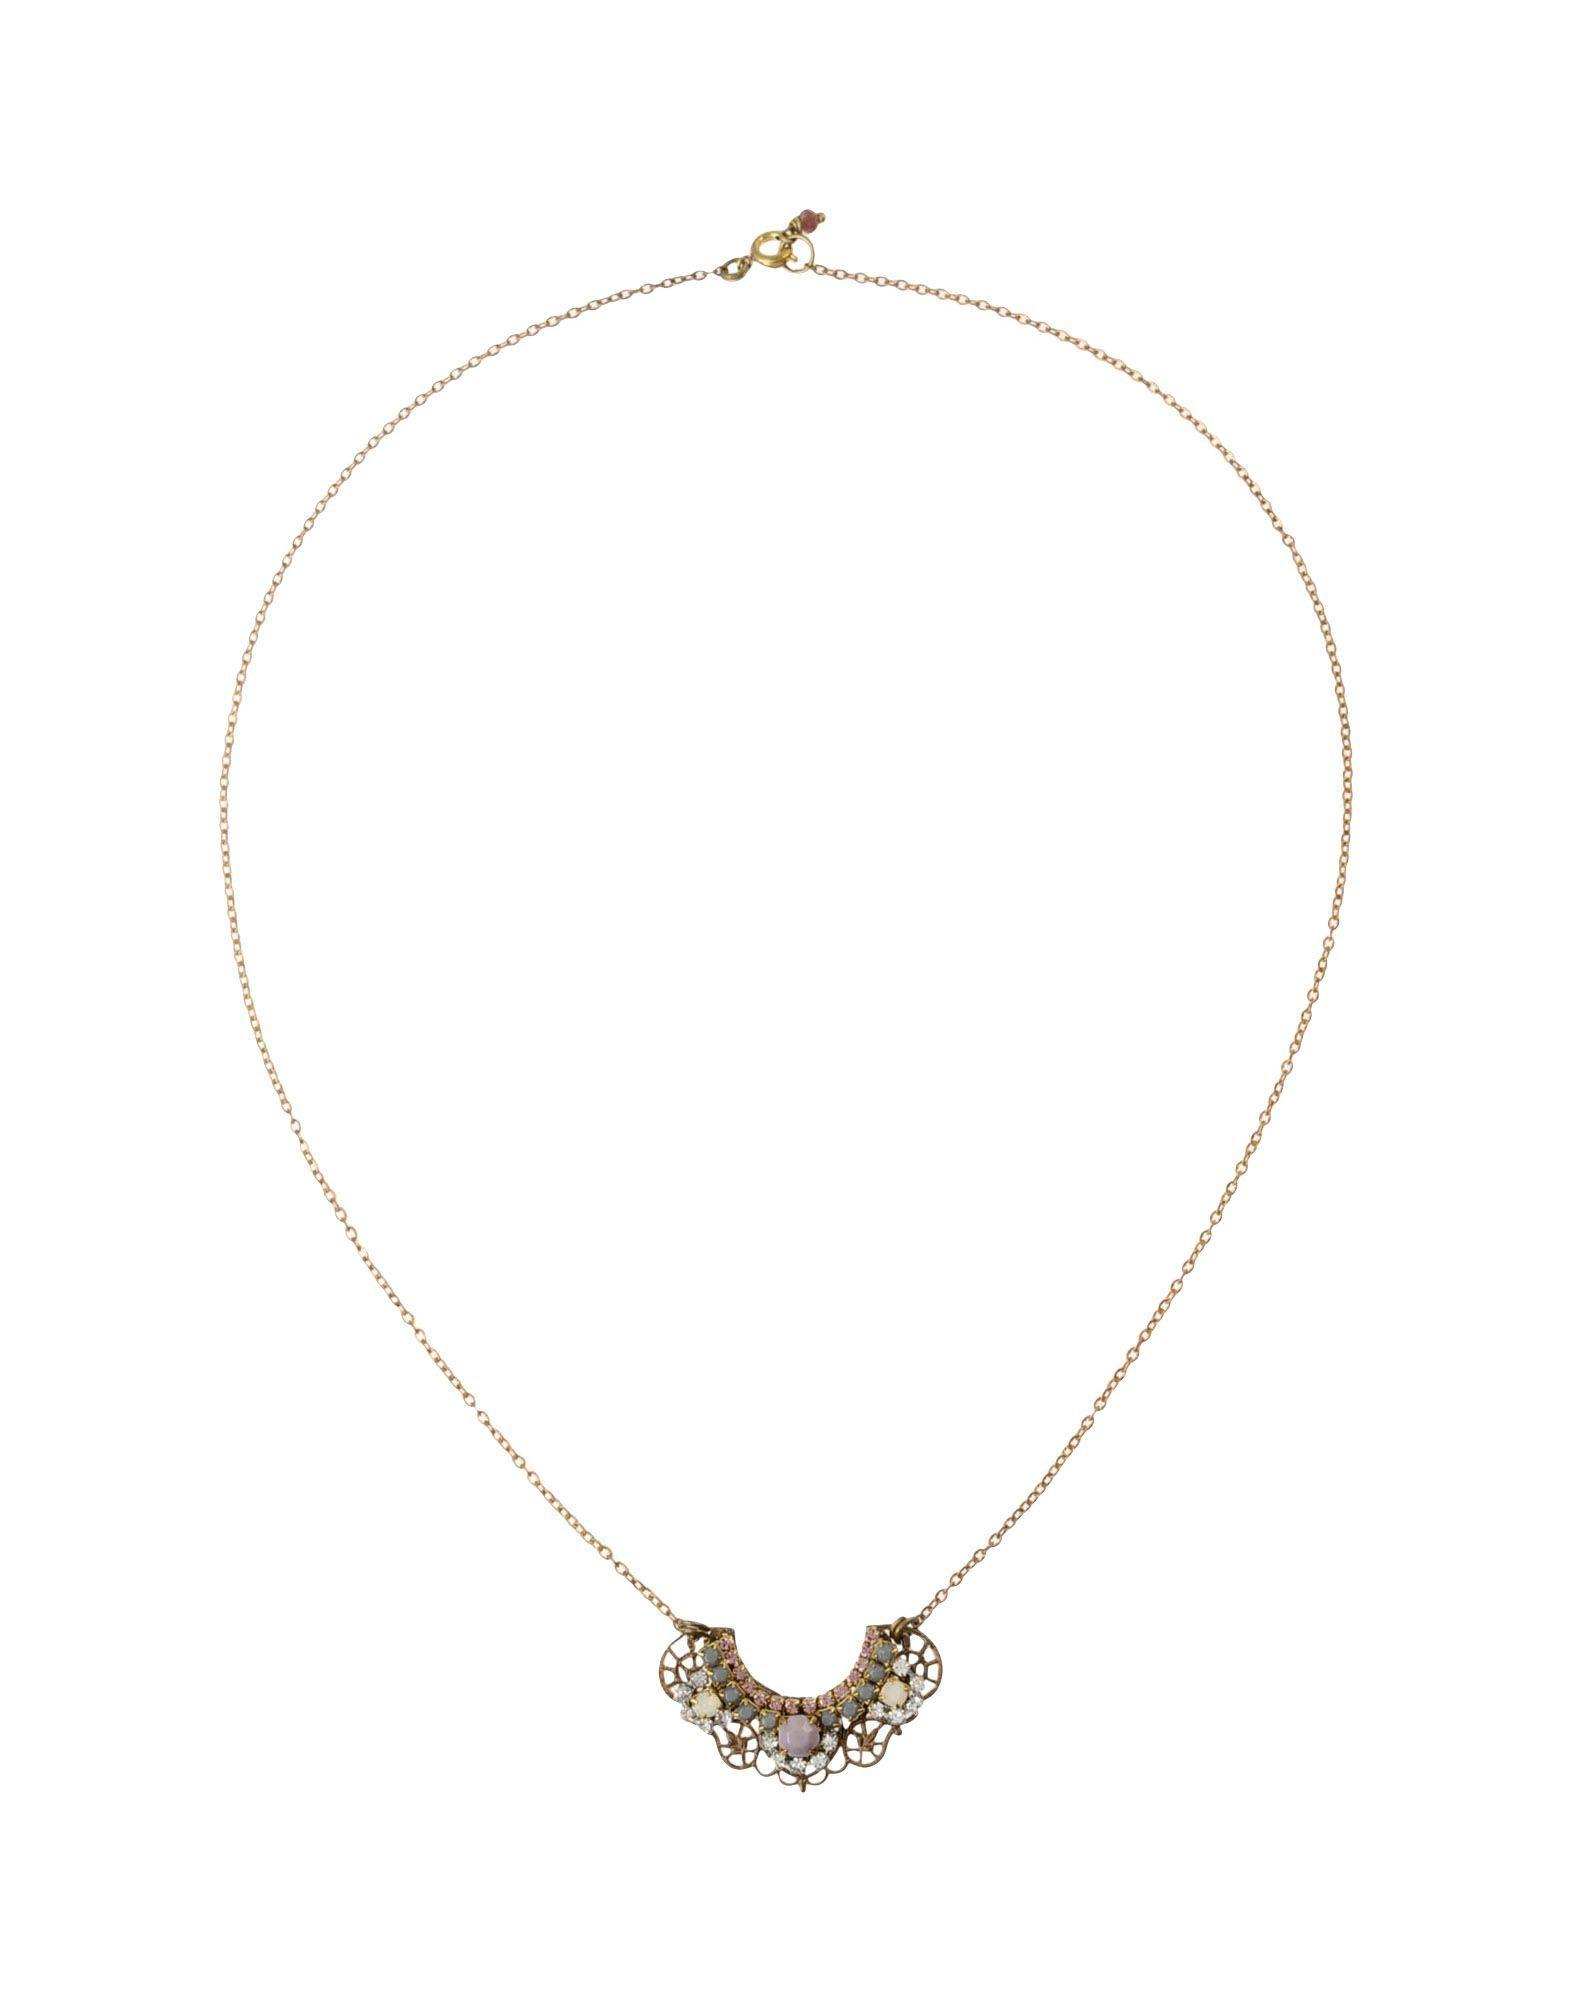 Federica salvatori franchi Women - Jewellery - Necklace Federica salvatori franchi on YOOX